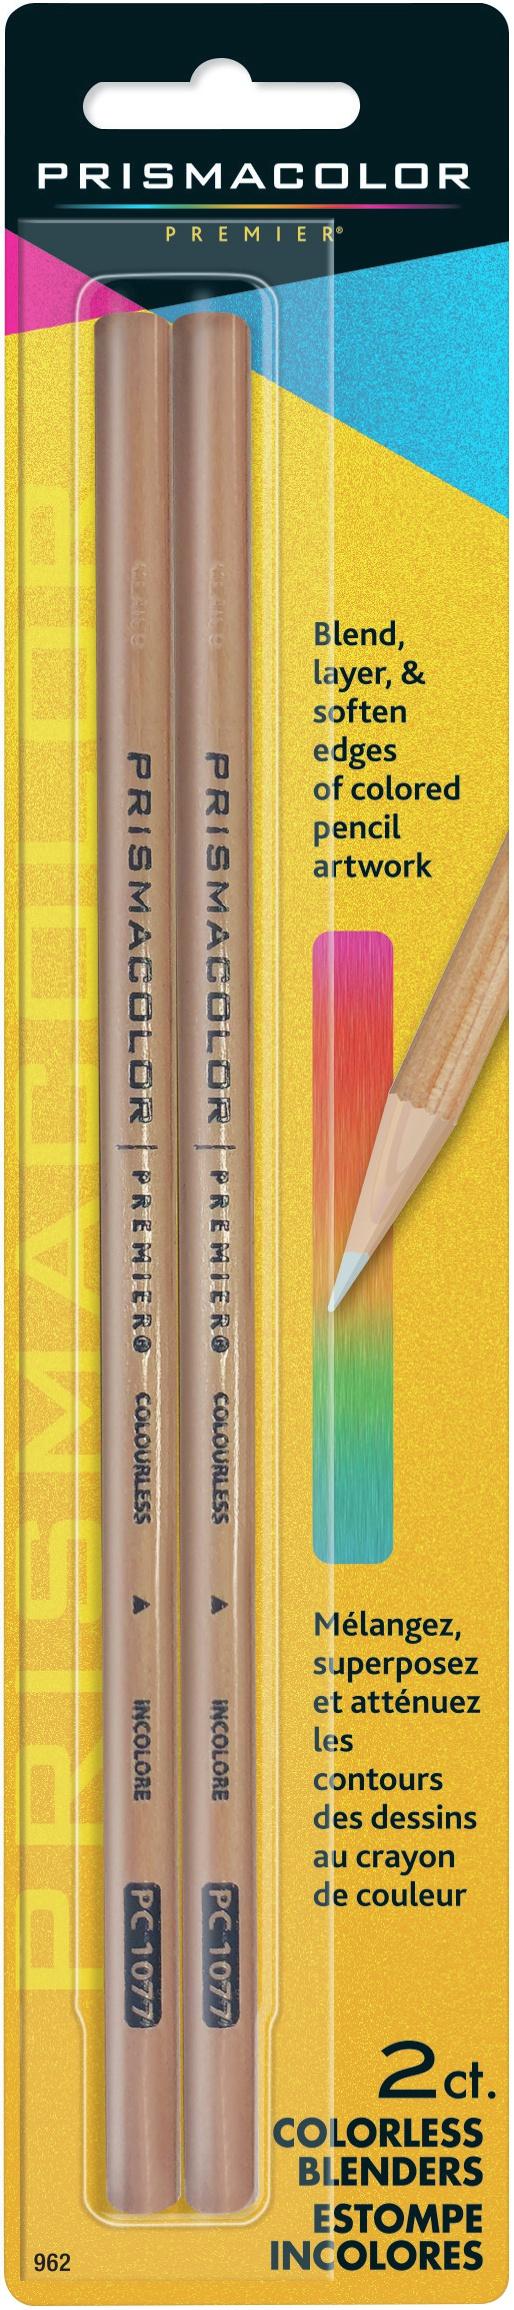 Prismacolor WaterColor Blender Pencil